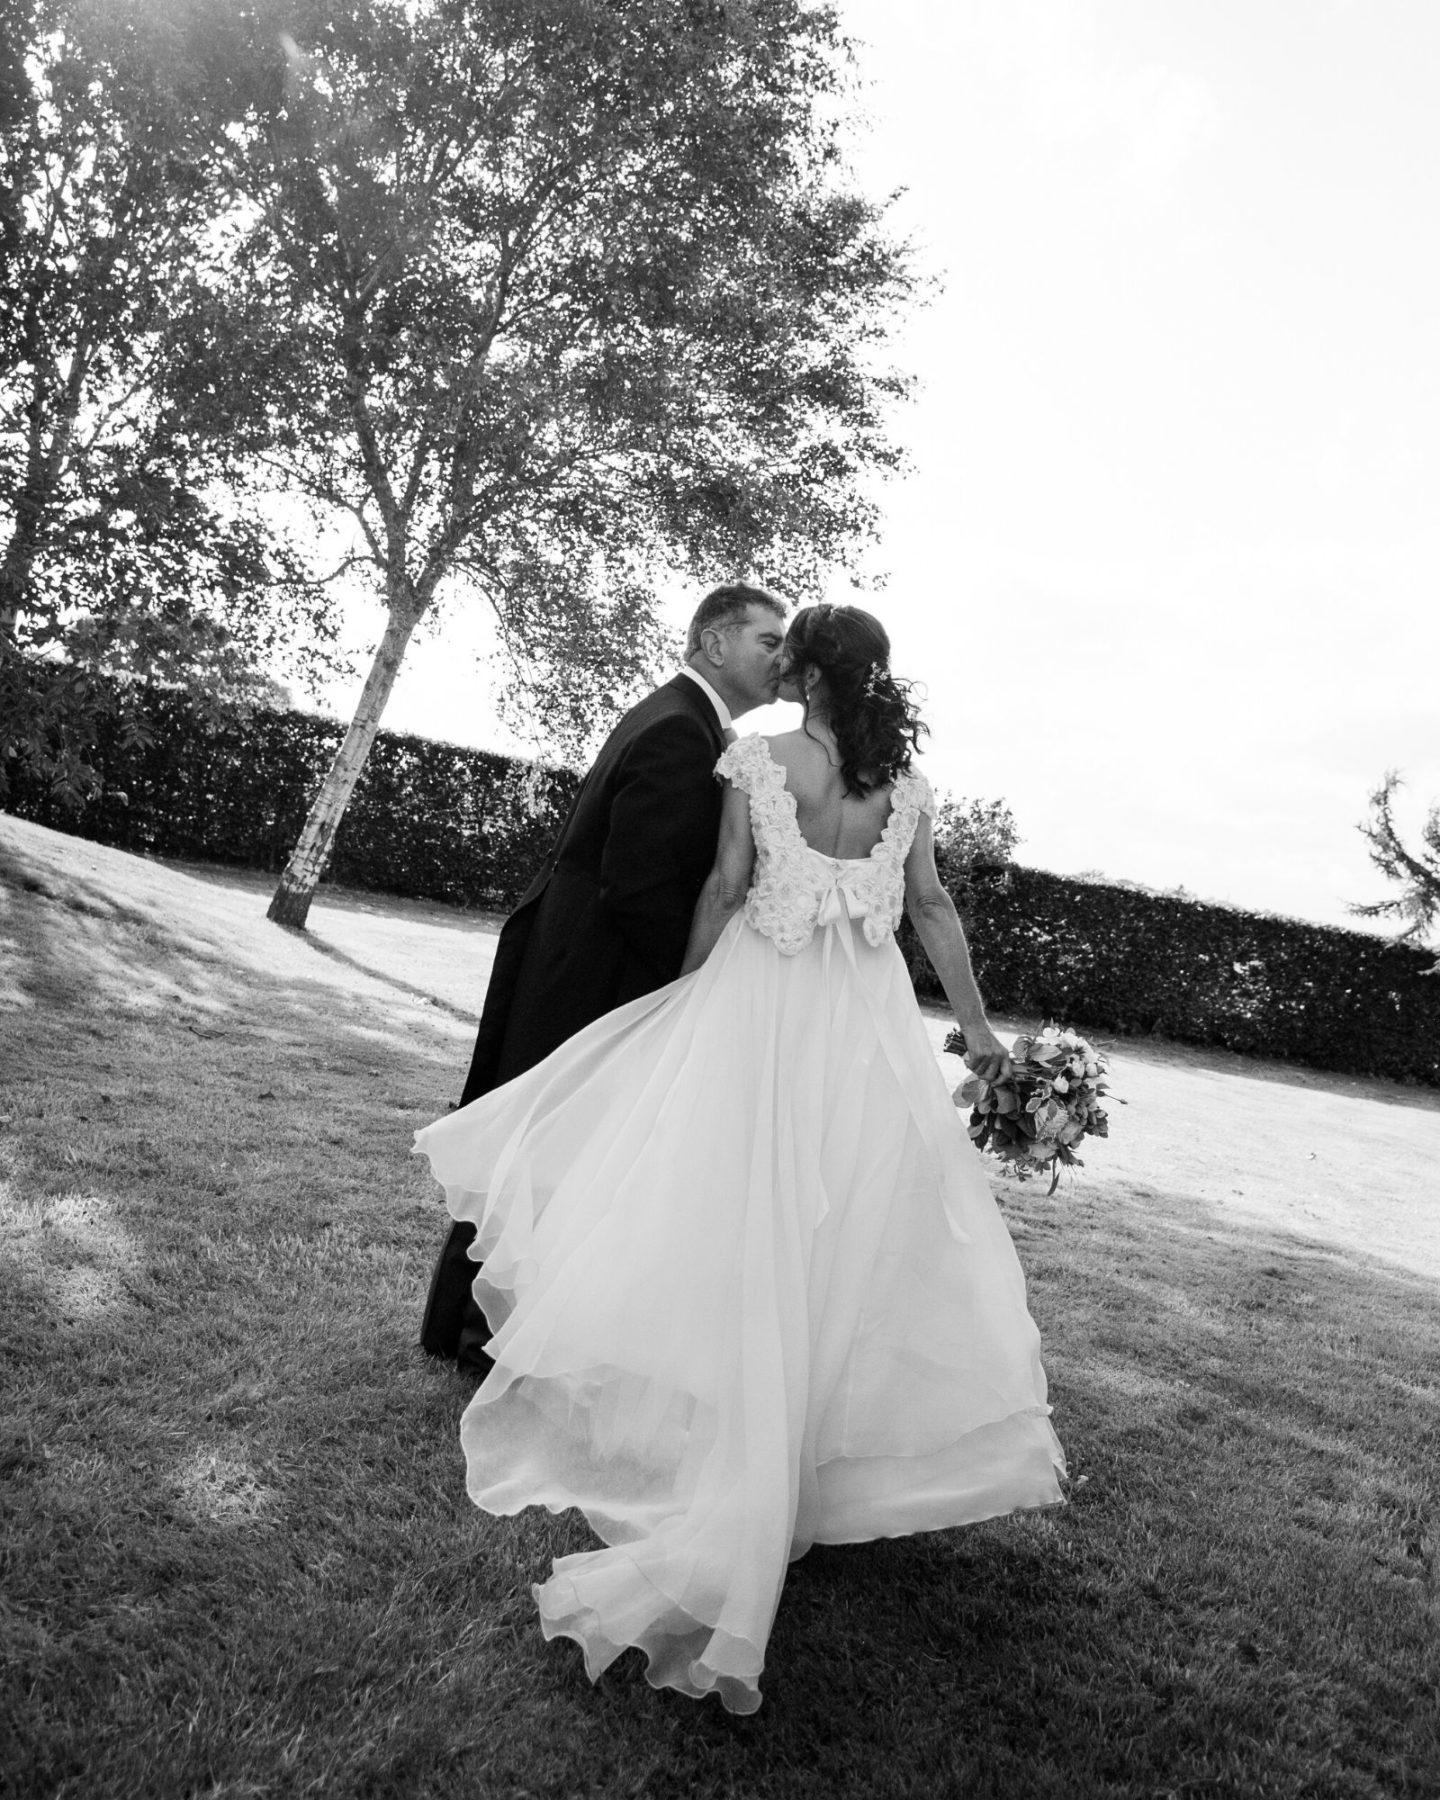 Wedding dress from Stratford Bridal Shop